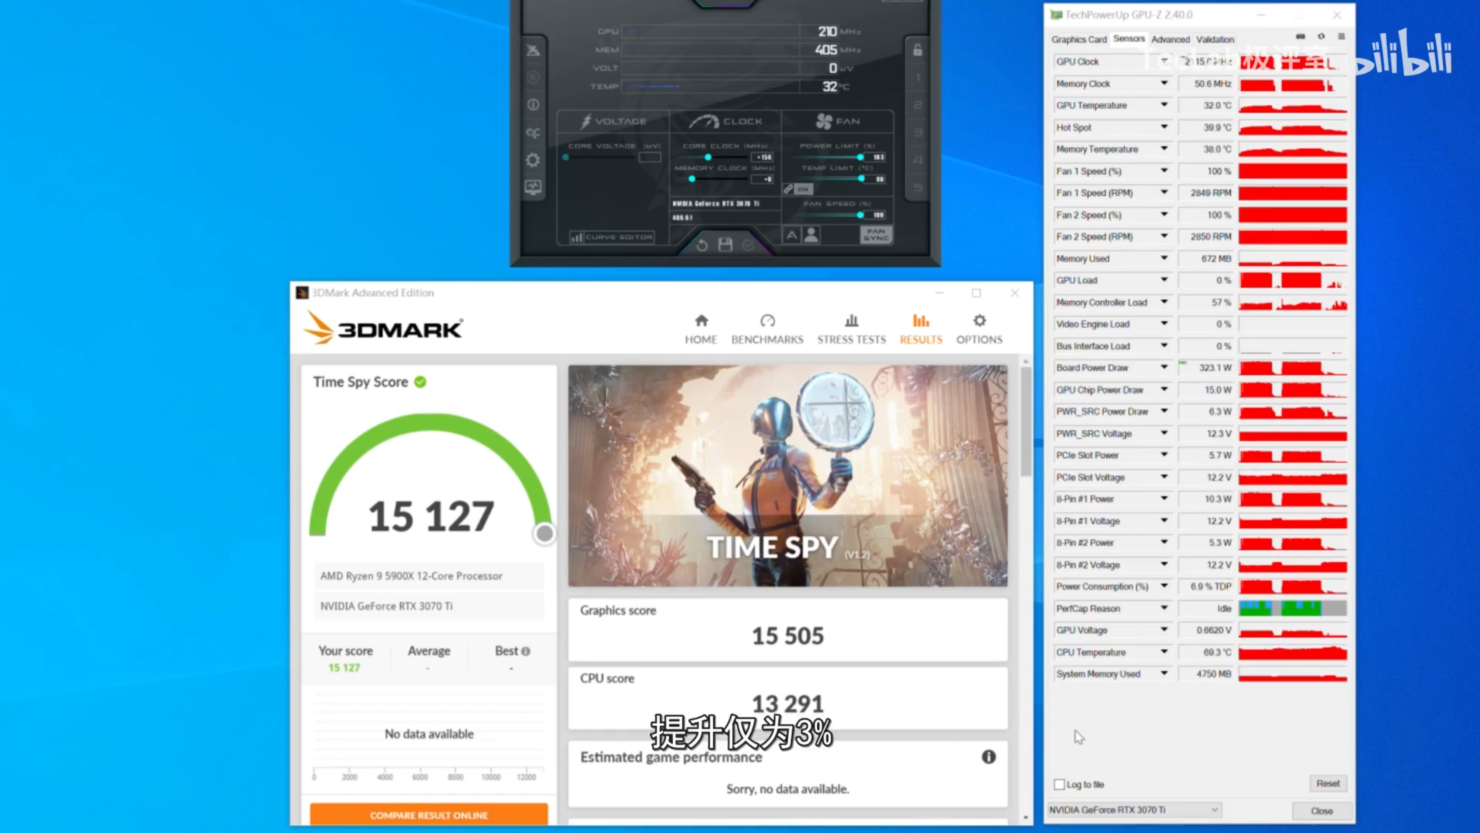 nvidia-geforce-rtx-3070-ti-graphics-card-benchmark-performance-leak-_overclocking